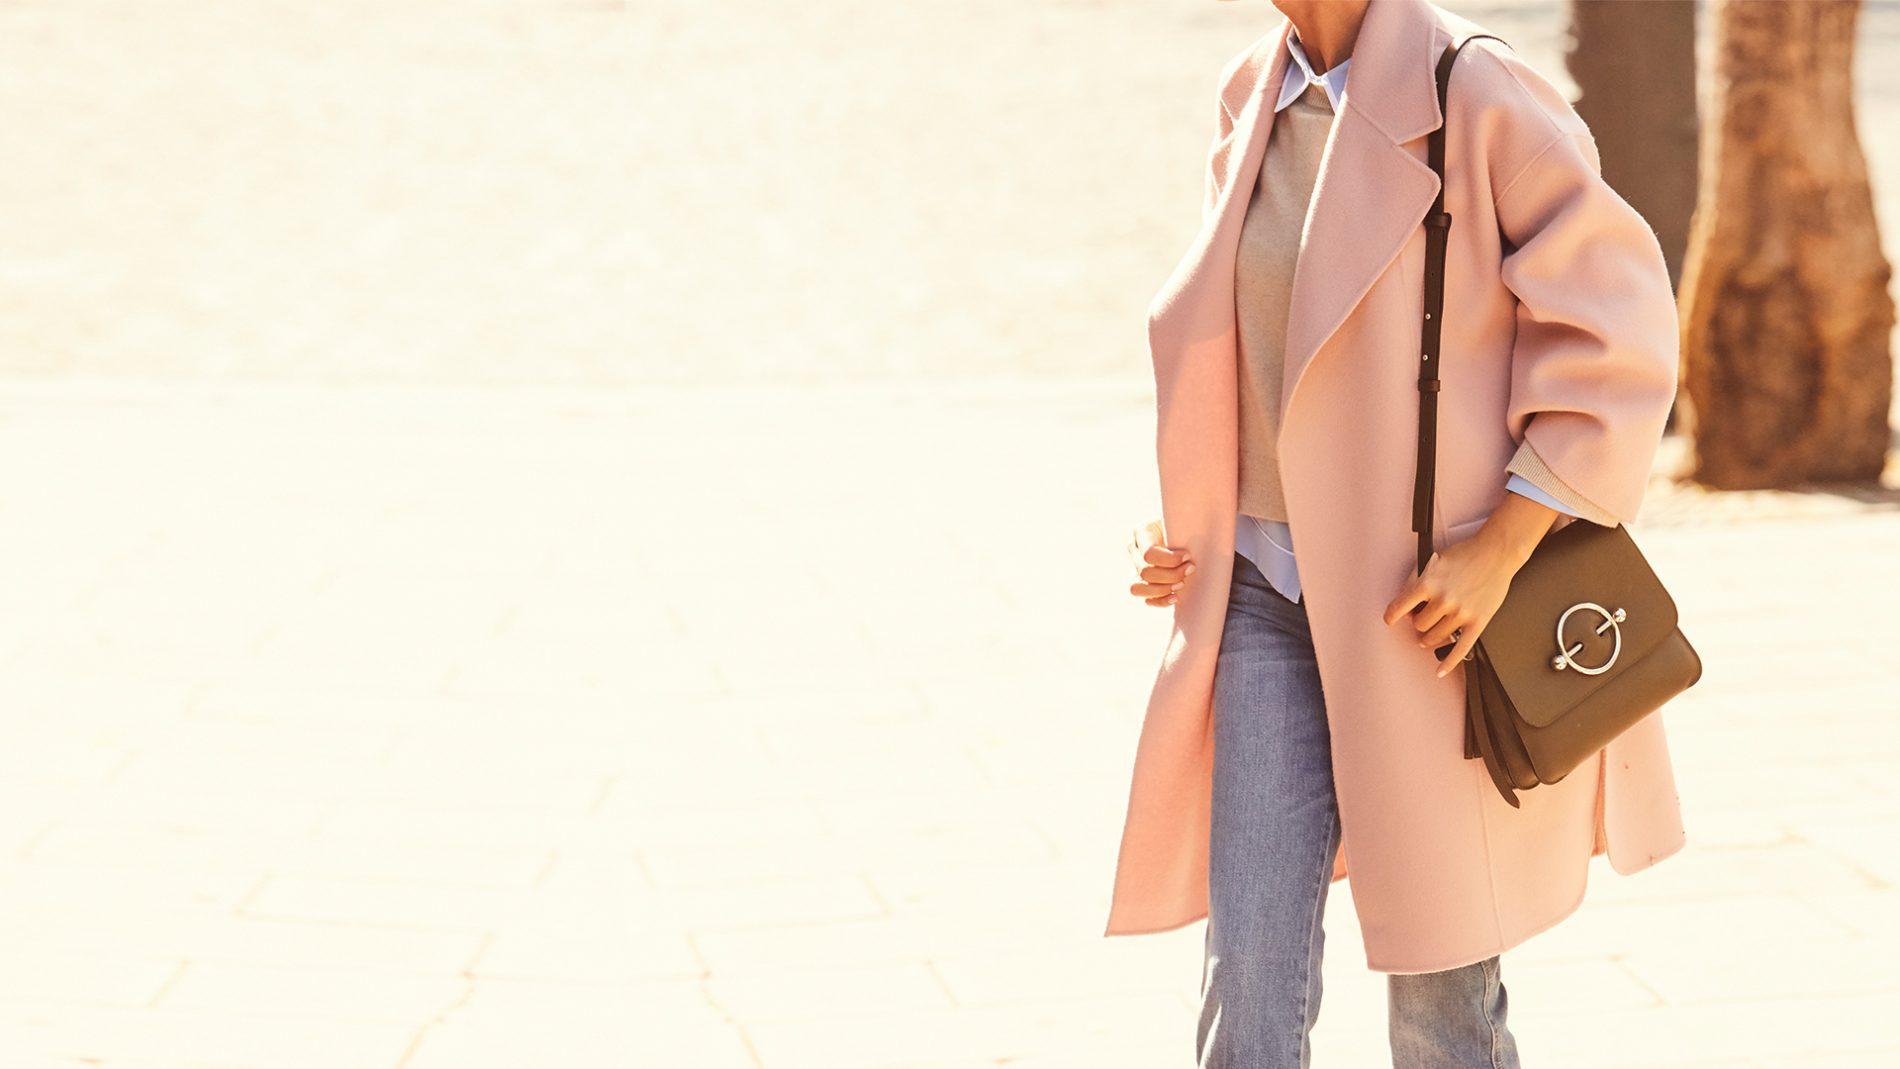 El Corte Inglés Designer Handbags Ready-To-Wear Handbags JW Anderson, Theory, Equipment, Victoria Beckham